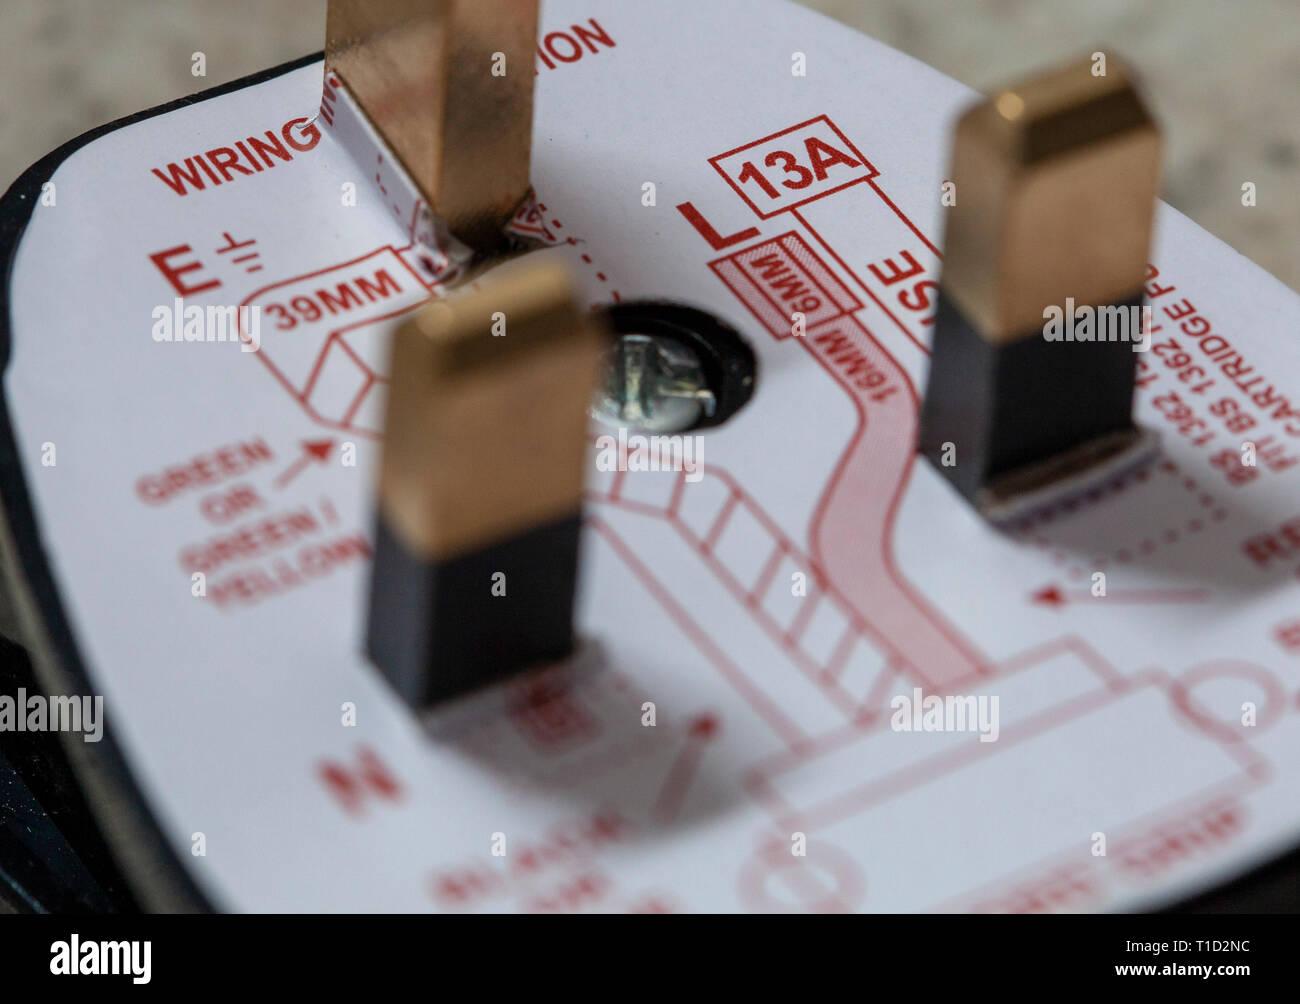 UK plug connection diagram Stock Photo